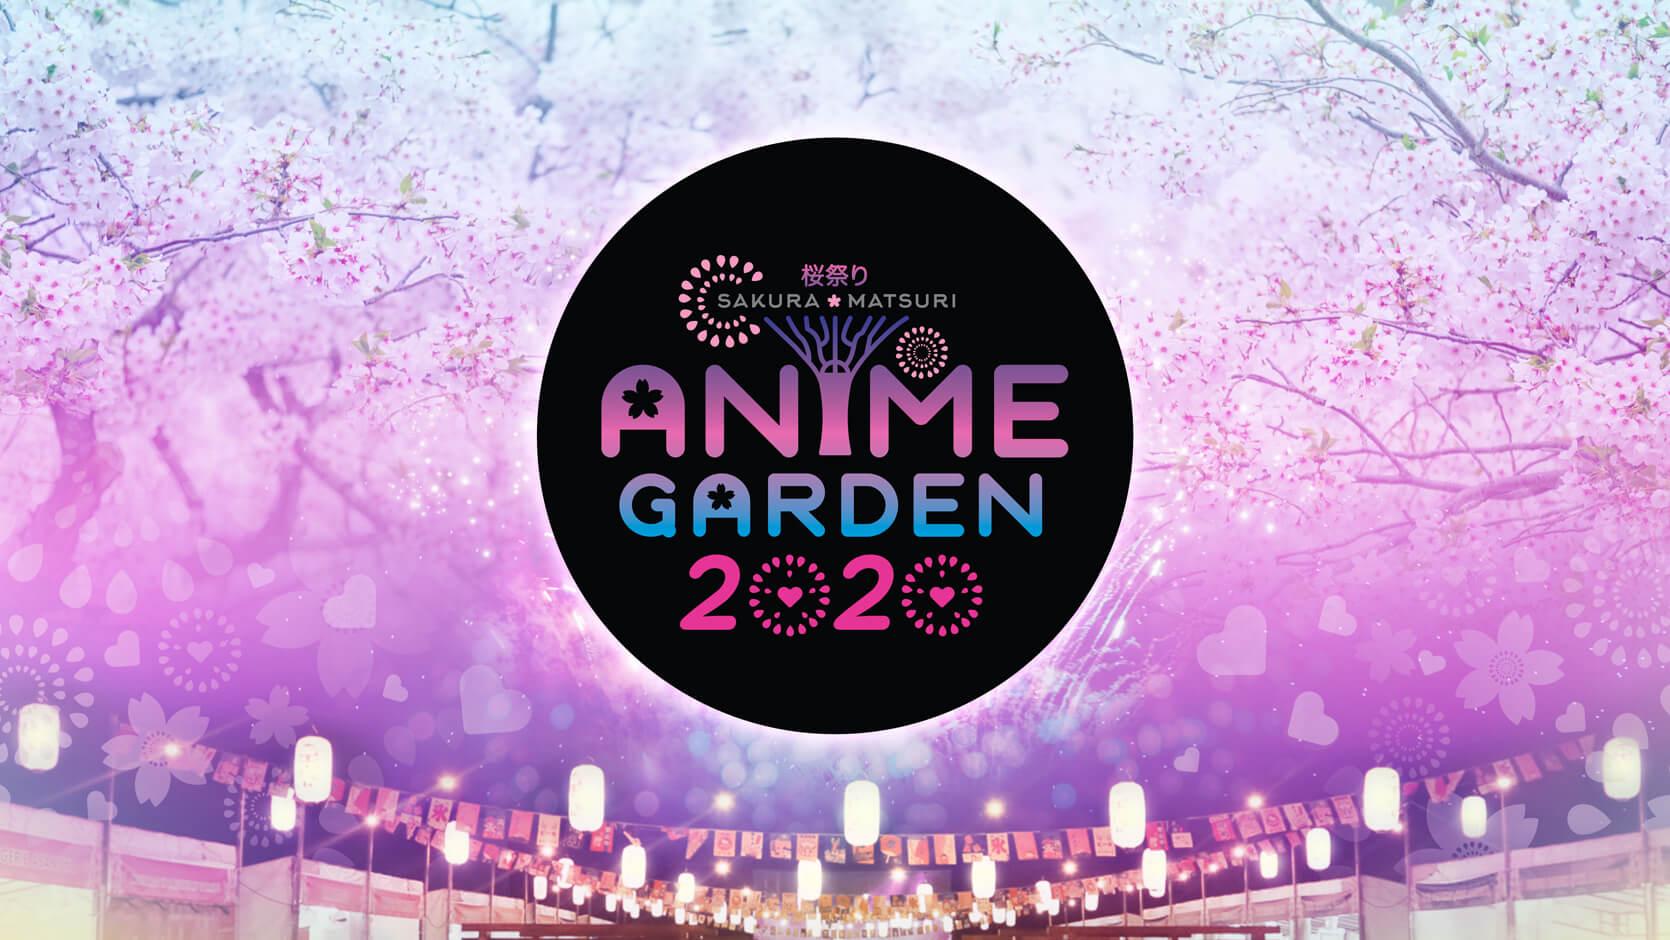 [開催中止] Sakura Matsuri : Anime Garden 2020